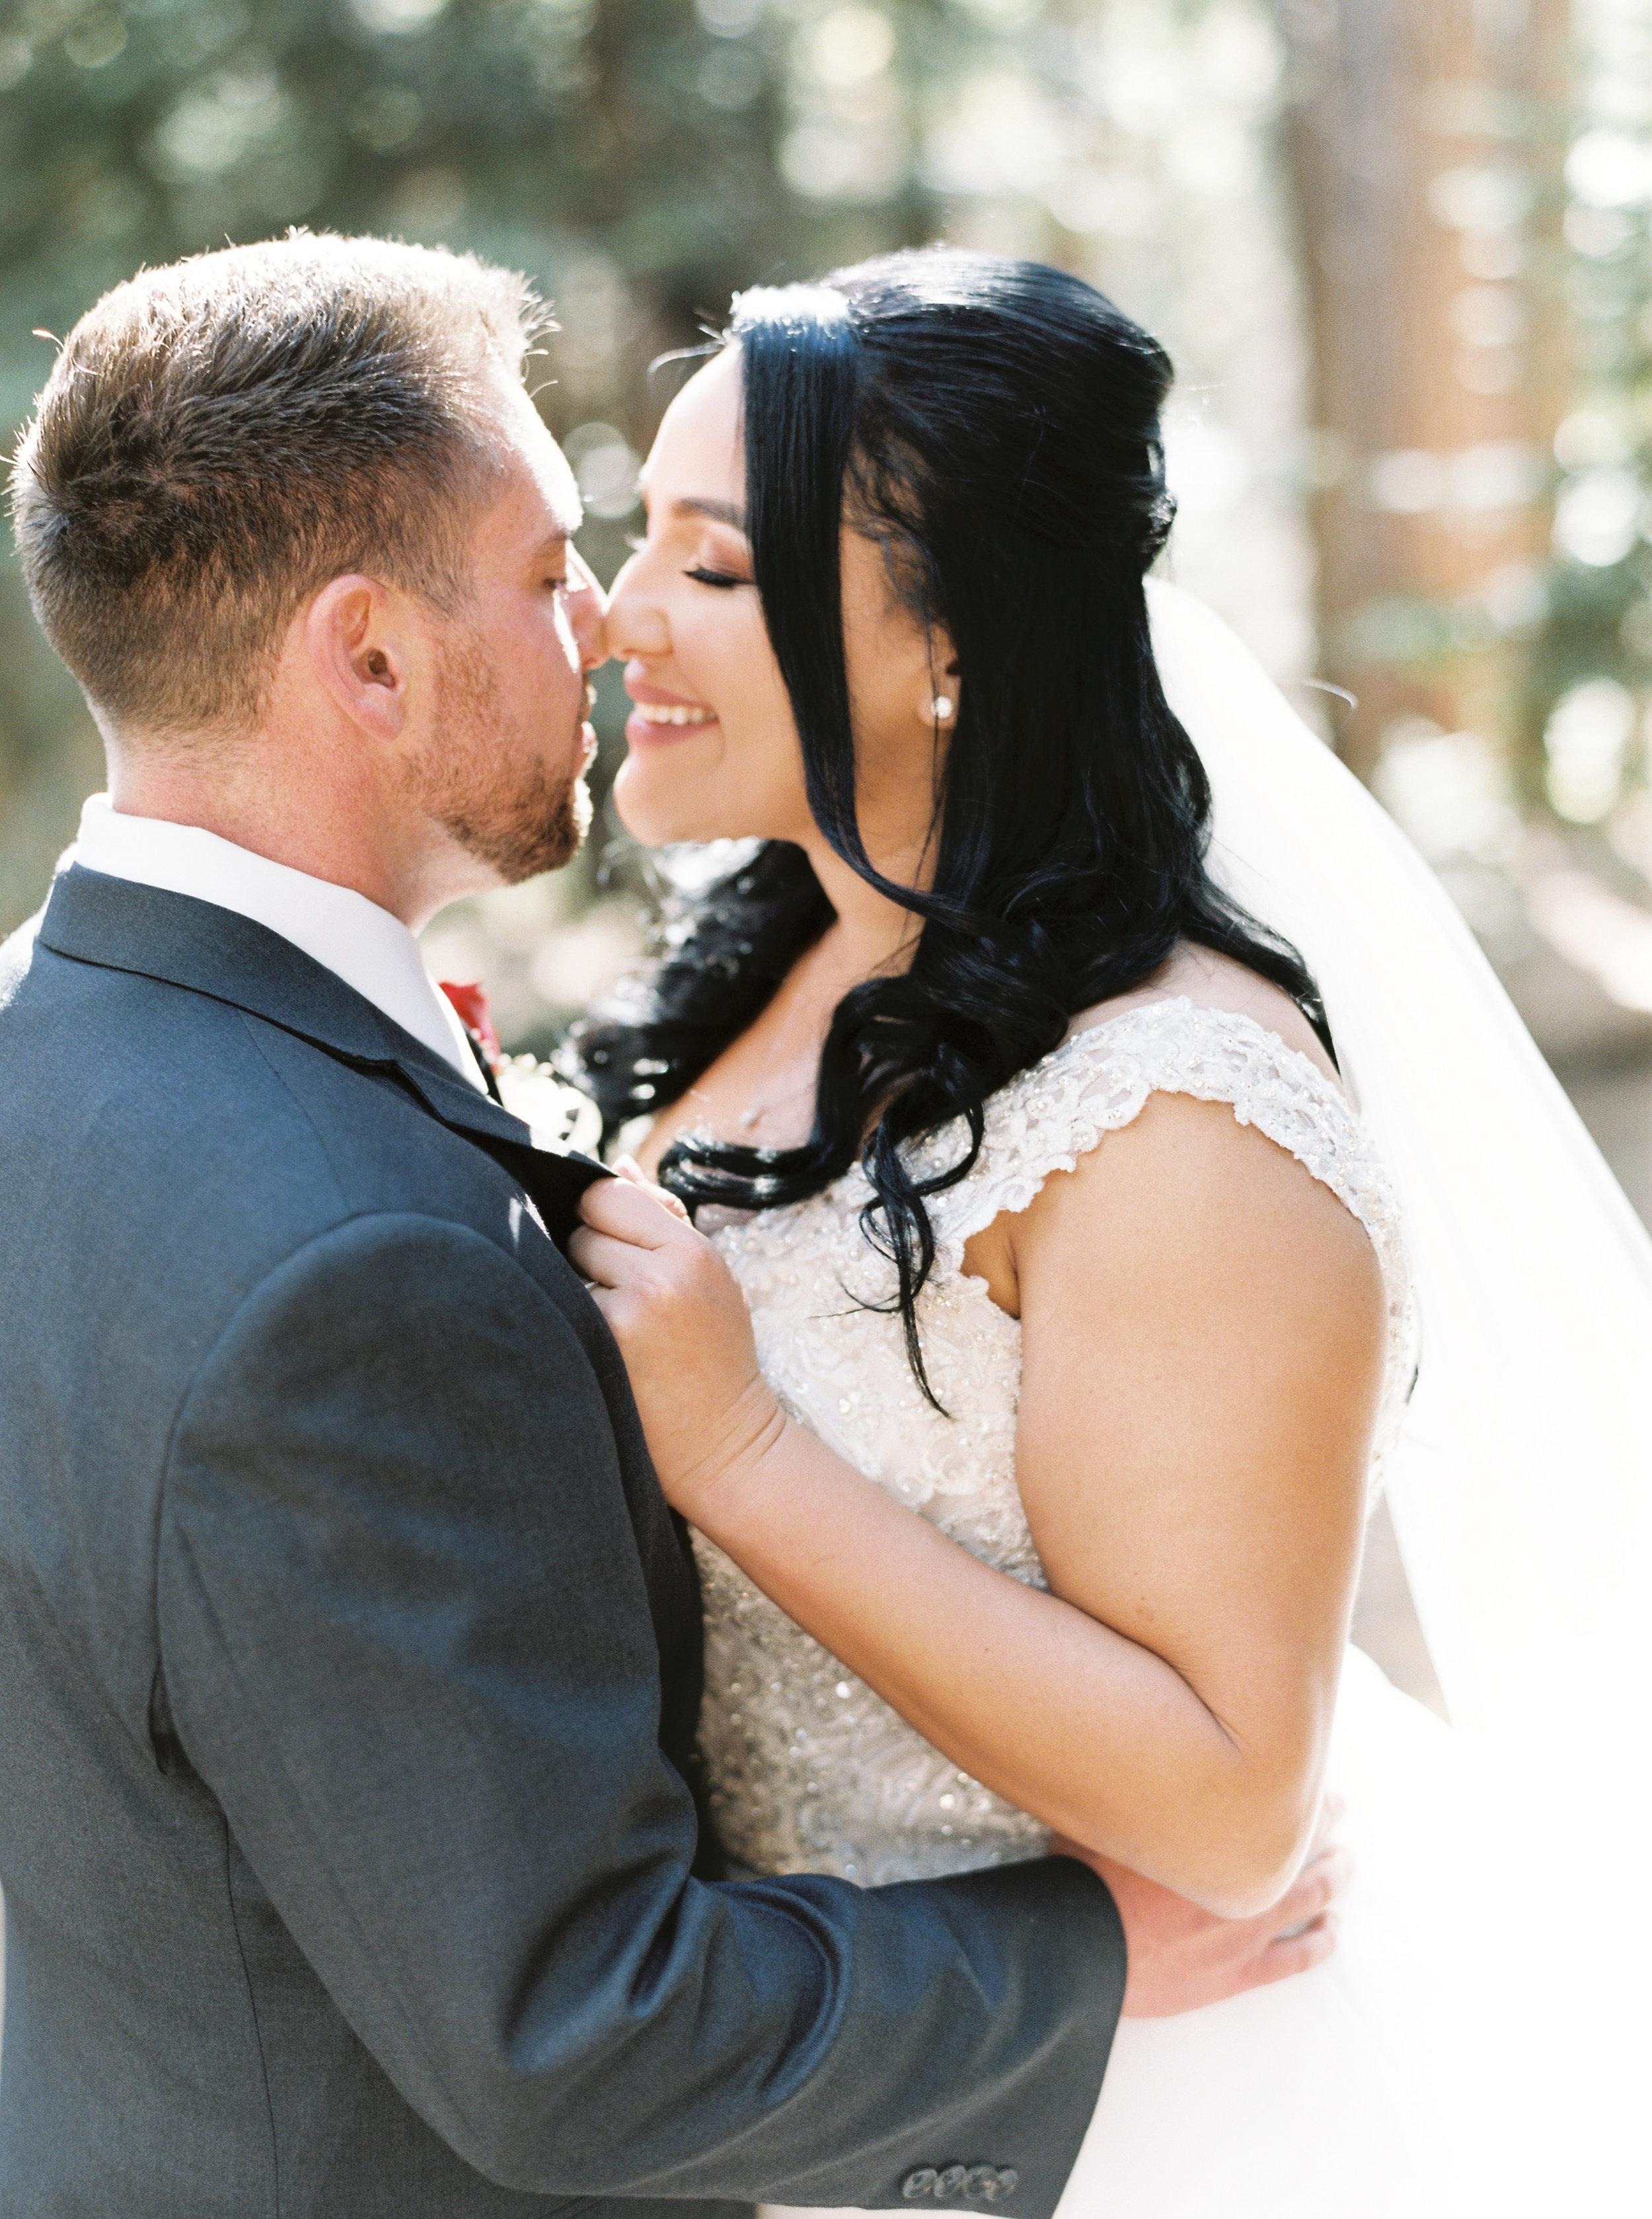 Tenaya-lodge-wedding-at-yosemite-national-park-california-30.jpg